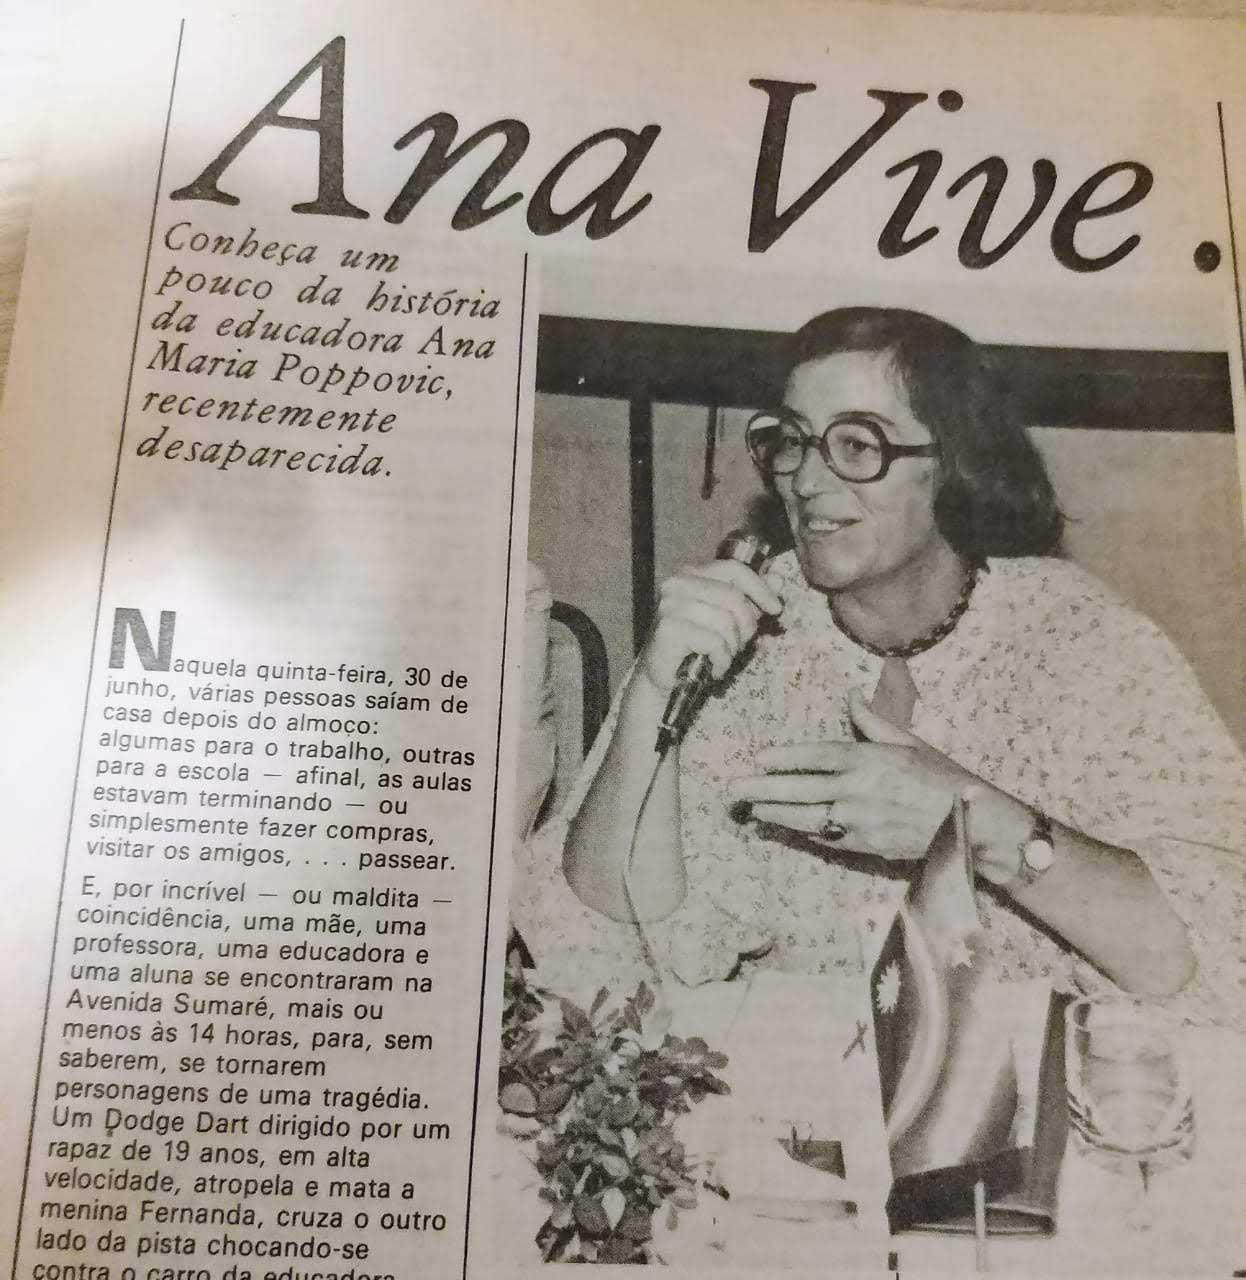 beatriz-scoz-primeira-mestra-supervisora-educacao-anna-maria-poppovic-inicio-decada-80